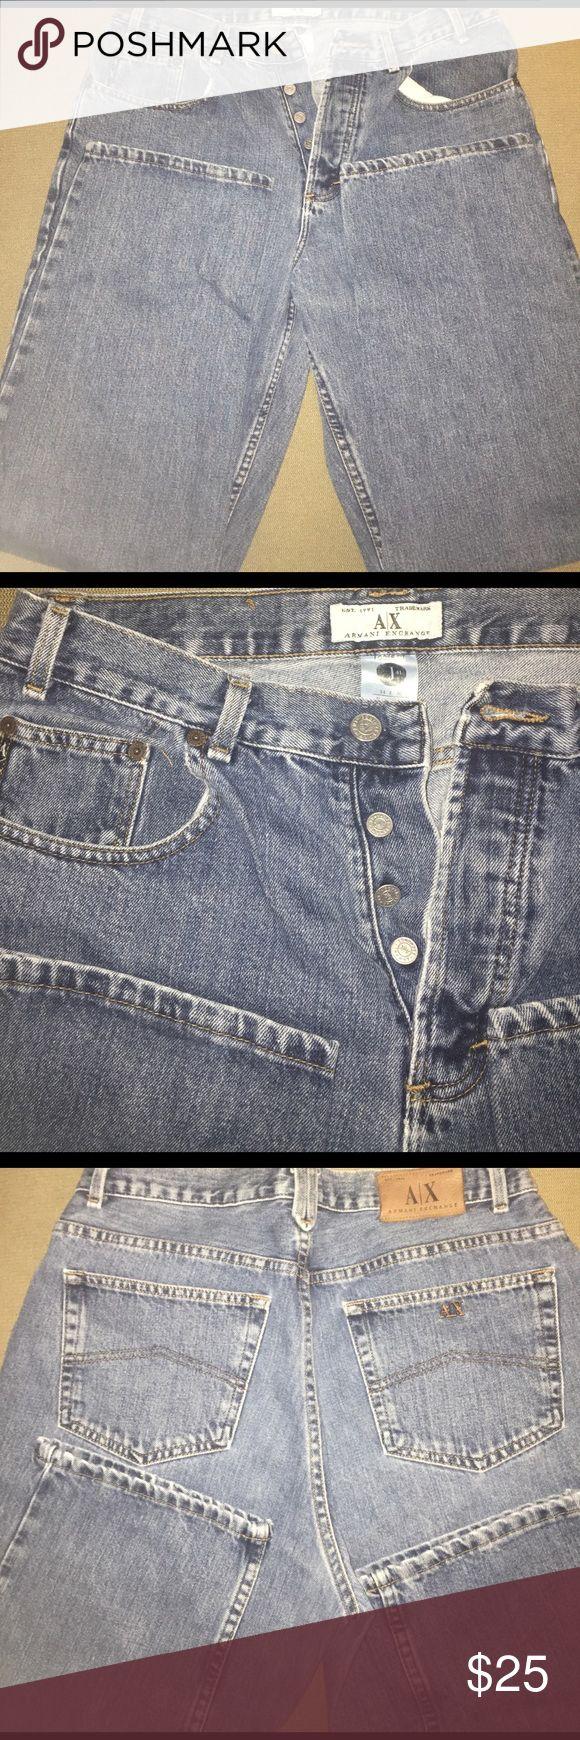 Armani Exchange Button Fly Jeans 34x30 Men's Button fly, 5 pocket jeans, cool copper emblem on back right pocket. 100% cotton 34x30 Armani Exchange Jeans Relaxed